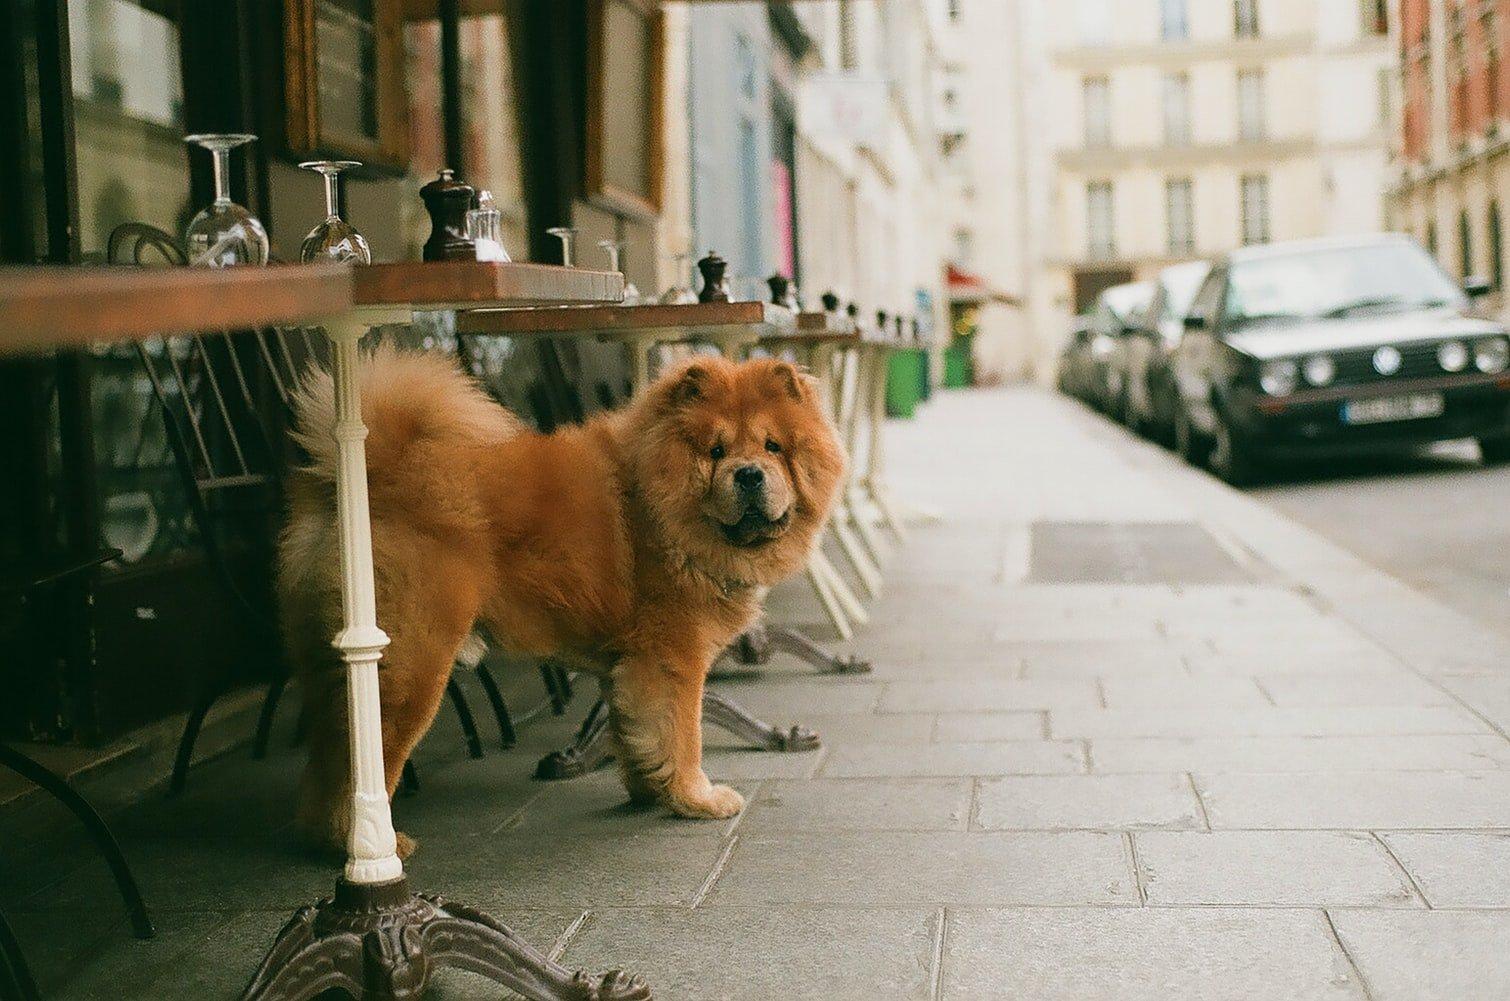 Best Dog Car Seat For Labrador